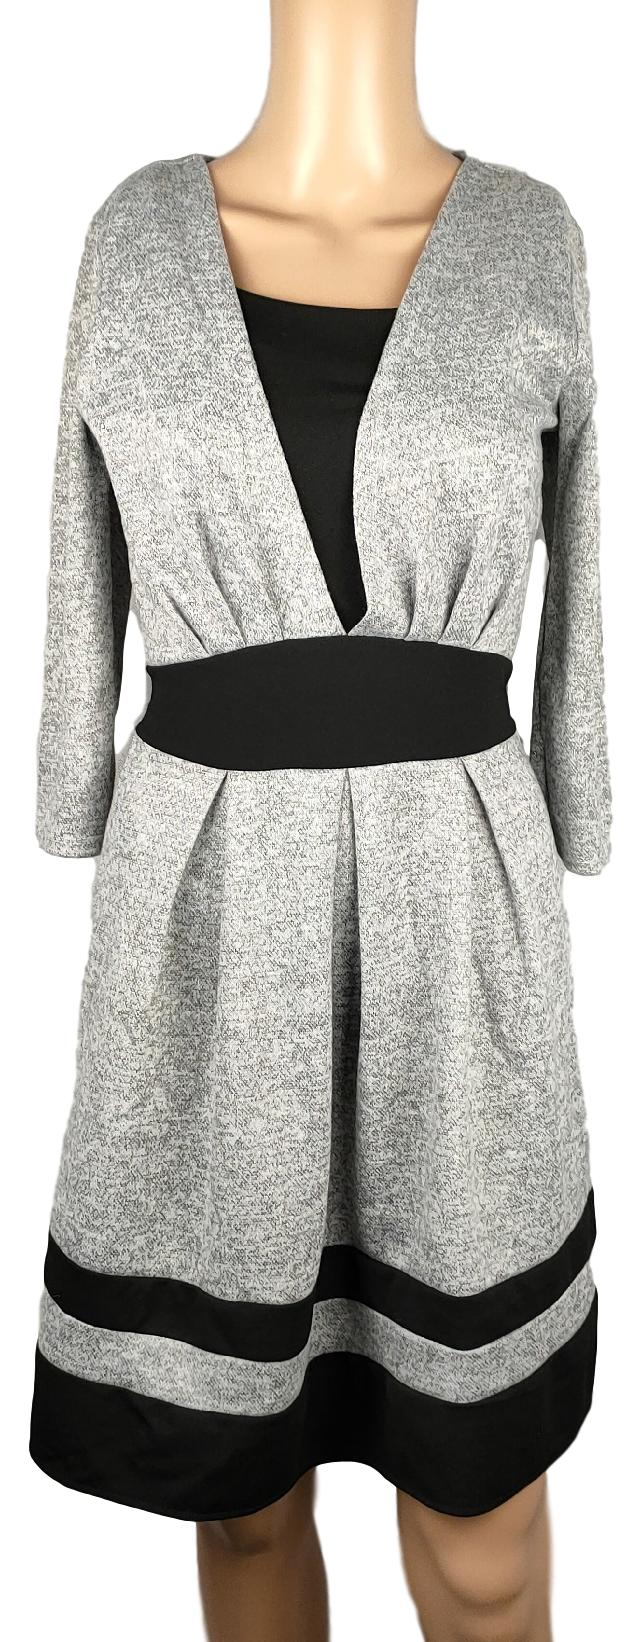 Robe Sans marque - Taille 34